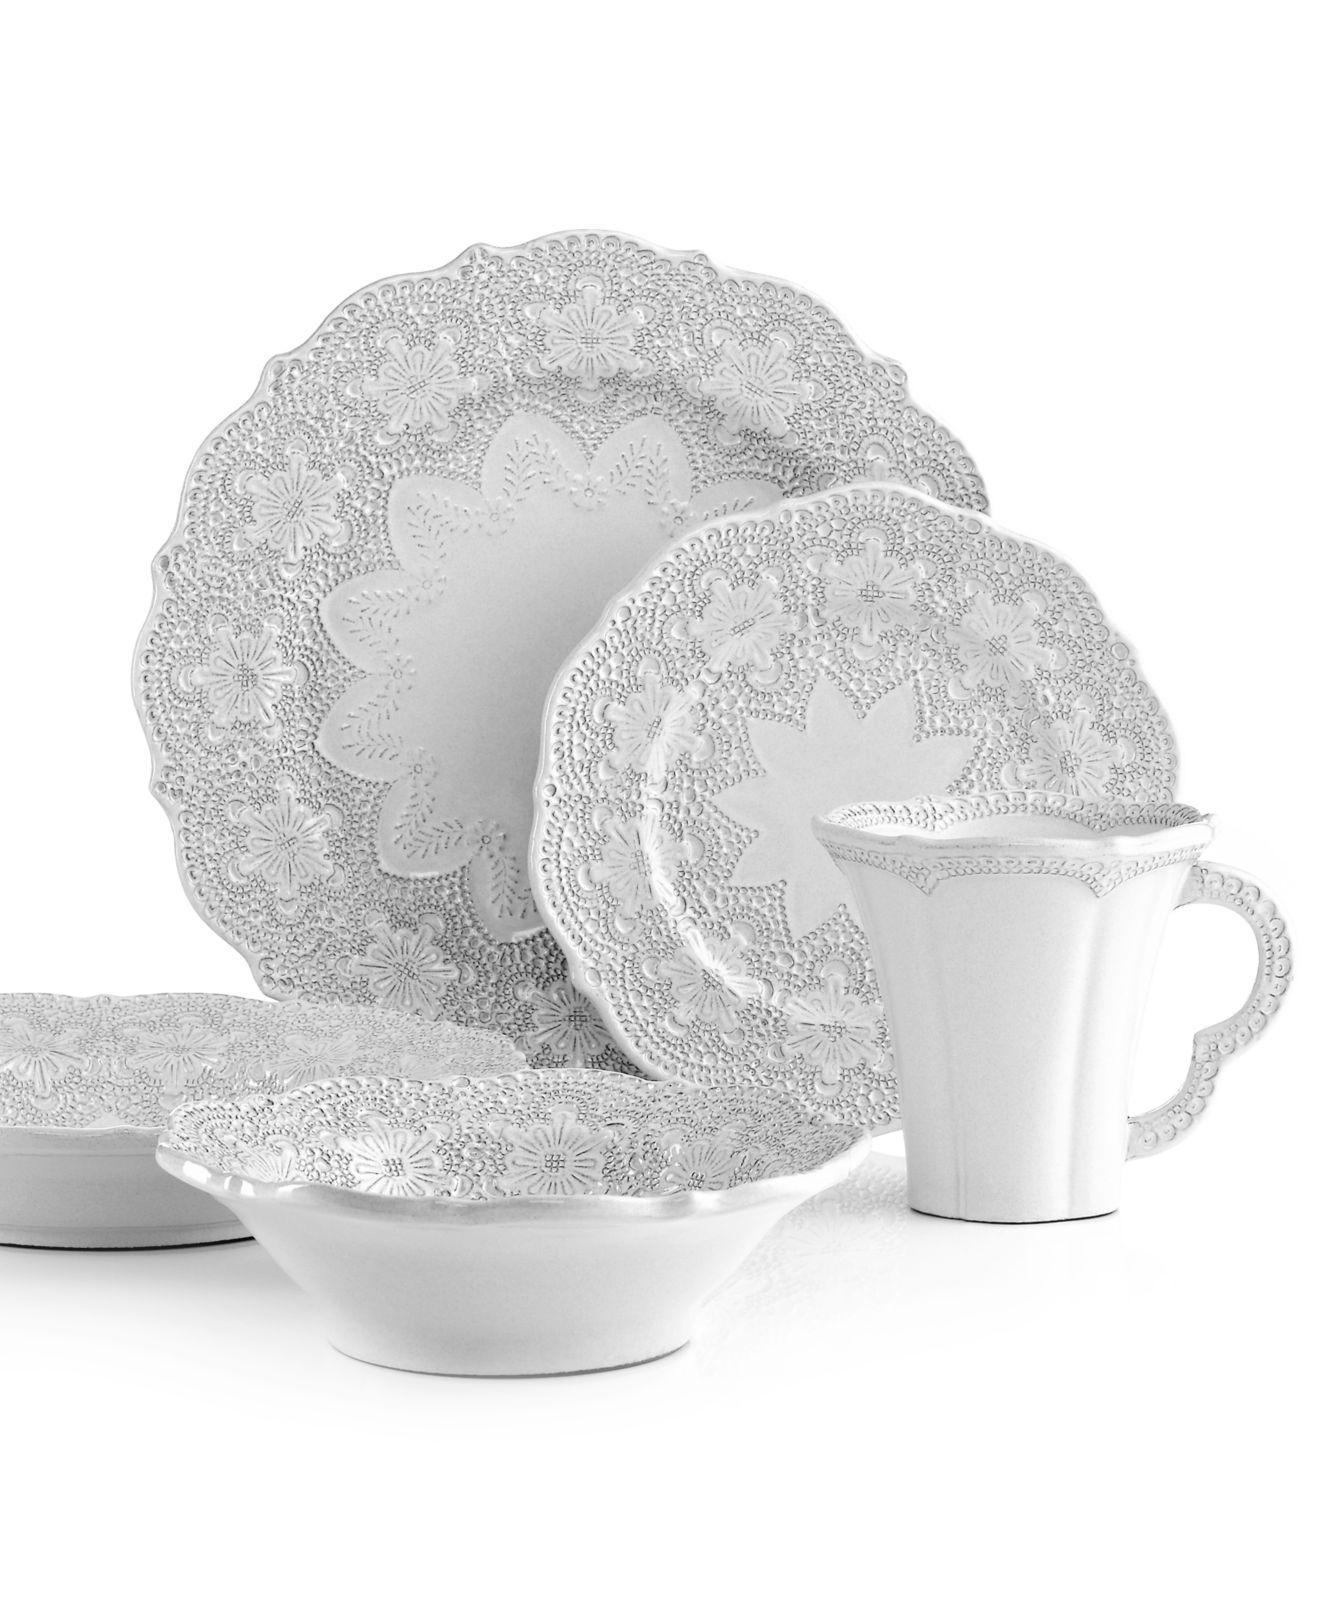 Arte Italica Dinnerware Merletto Antique  sc 1 st  Pinterest & Arte Italica Dinnerware Merletto Antique | Home - Place Settings ...